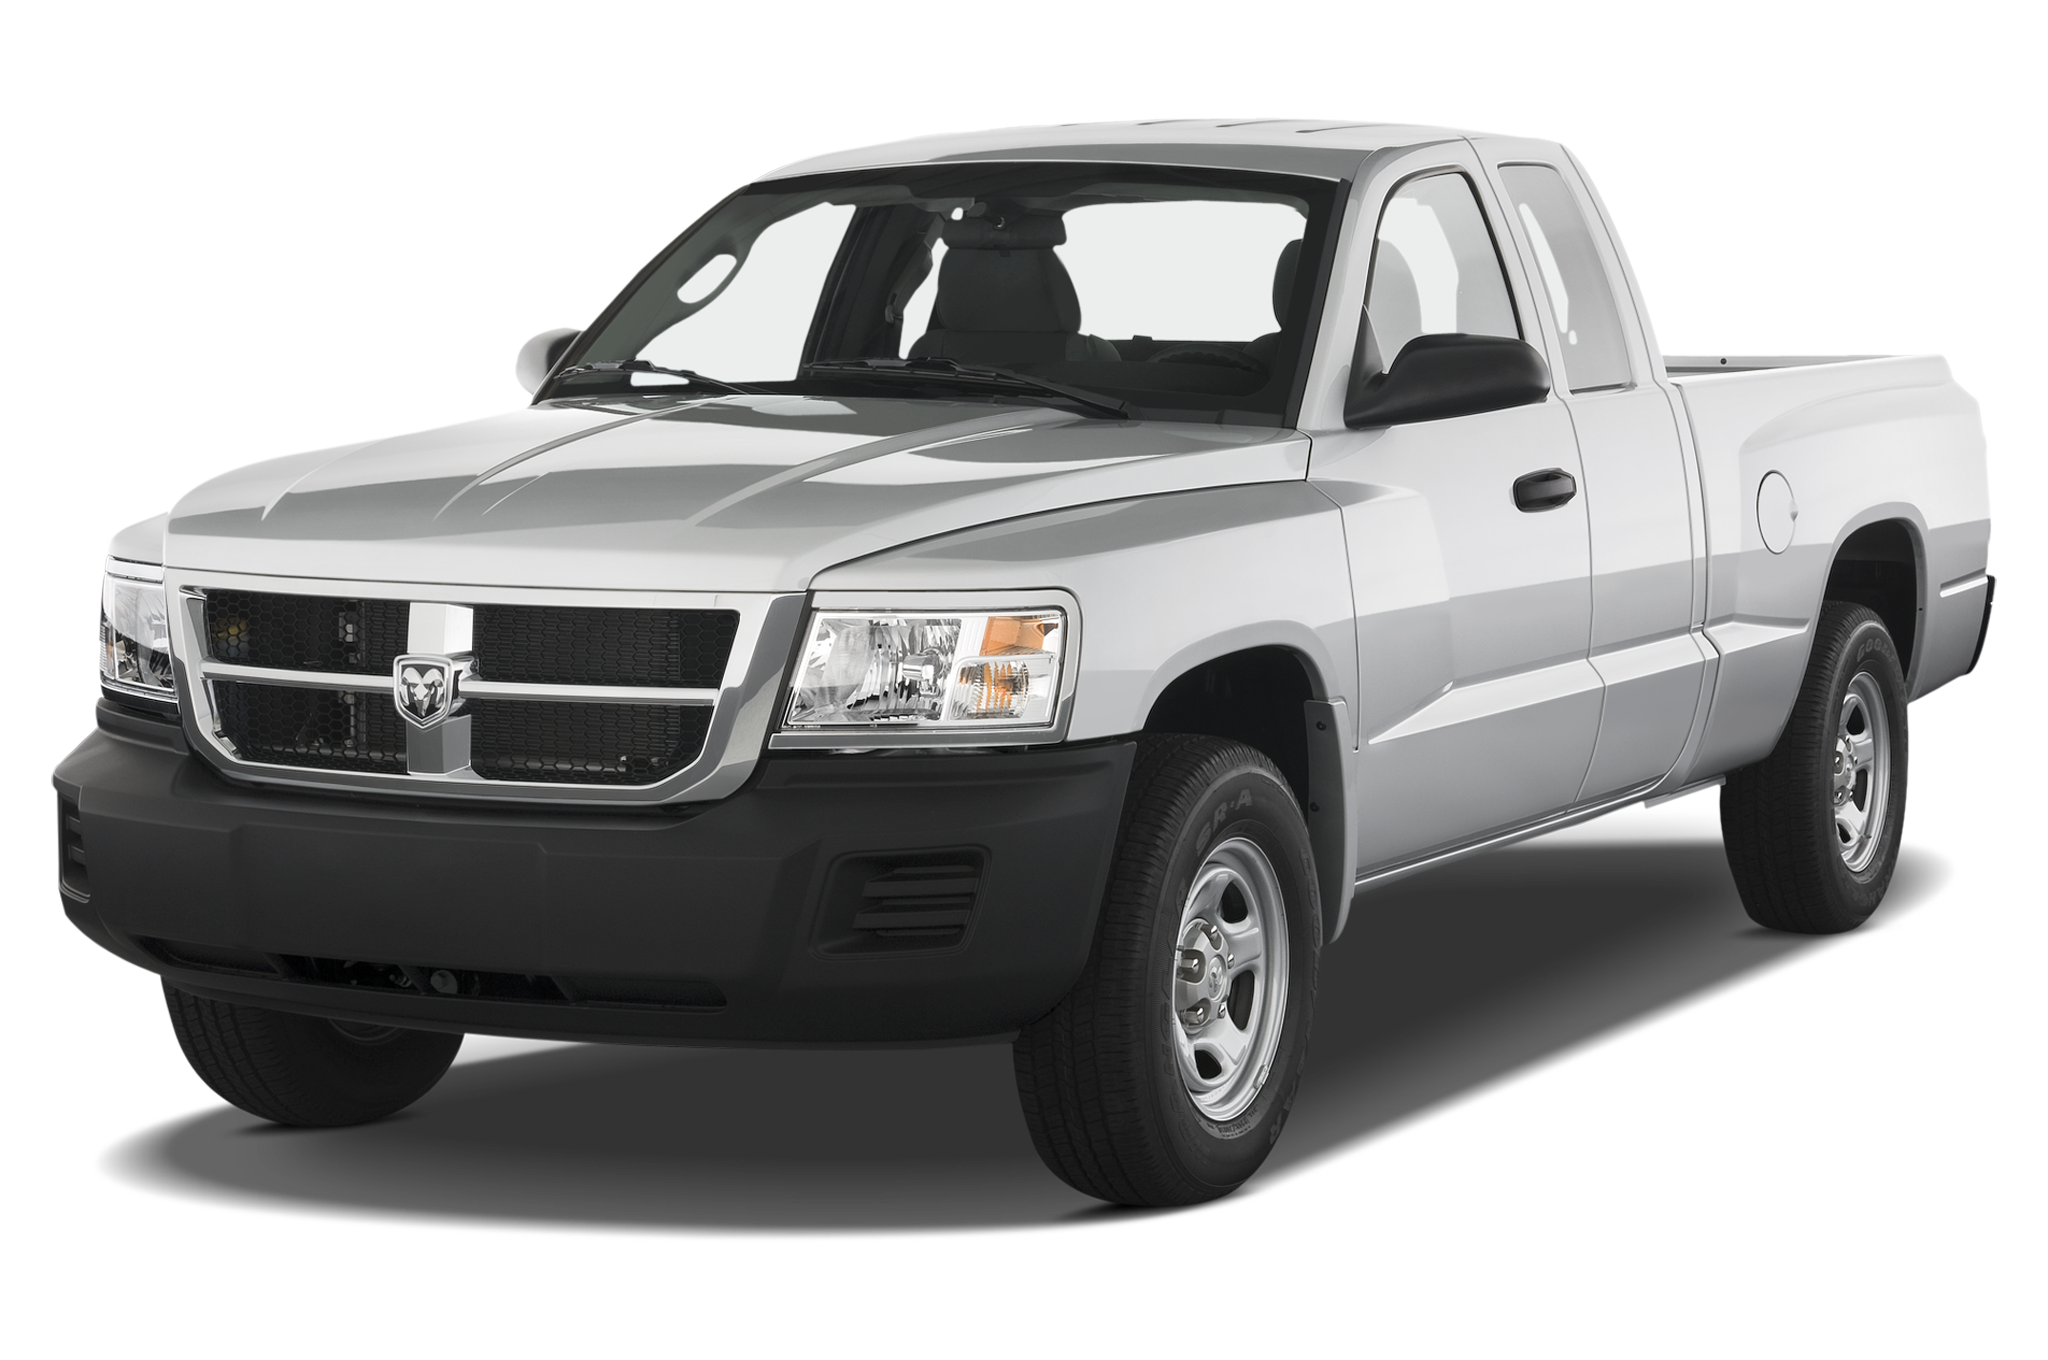 Dodge Tacoma - 2017 Dodge Charger